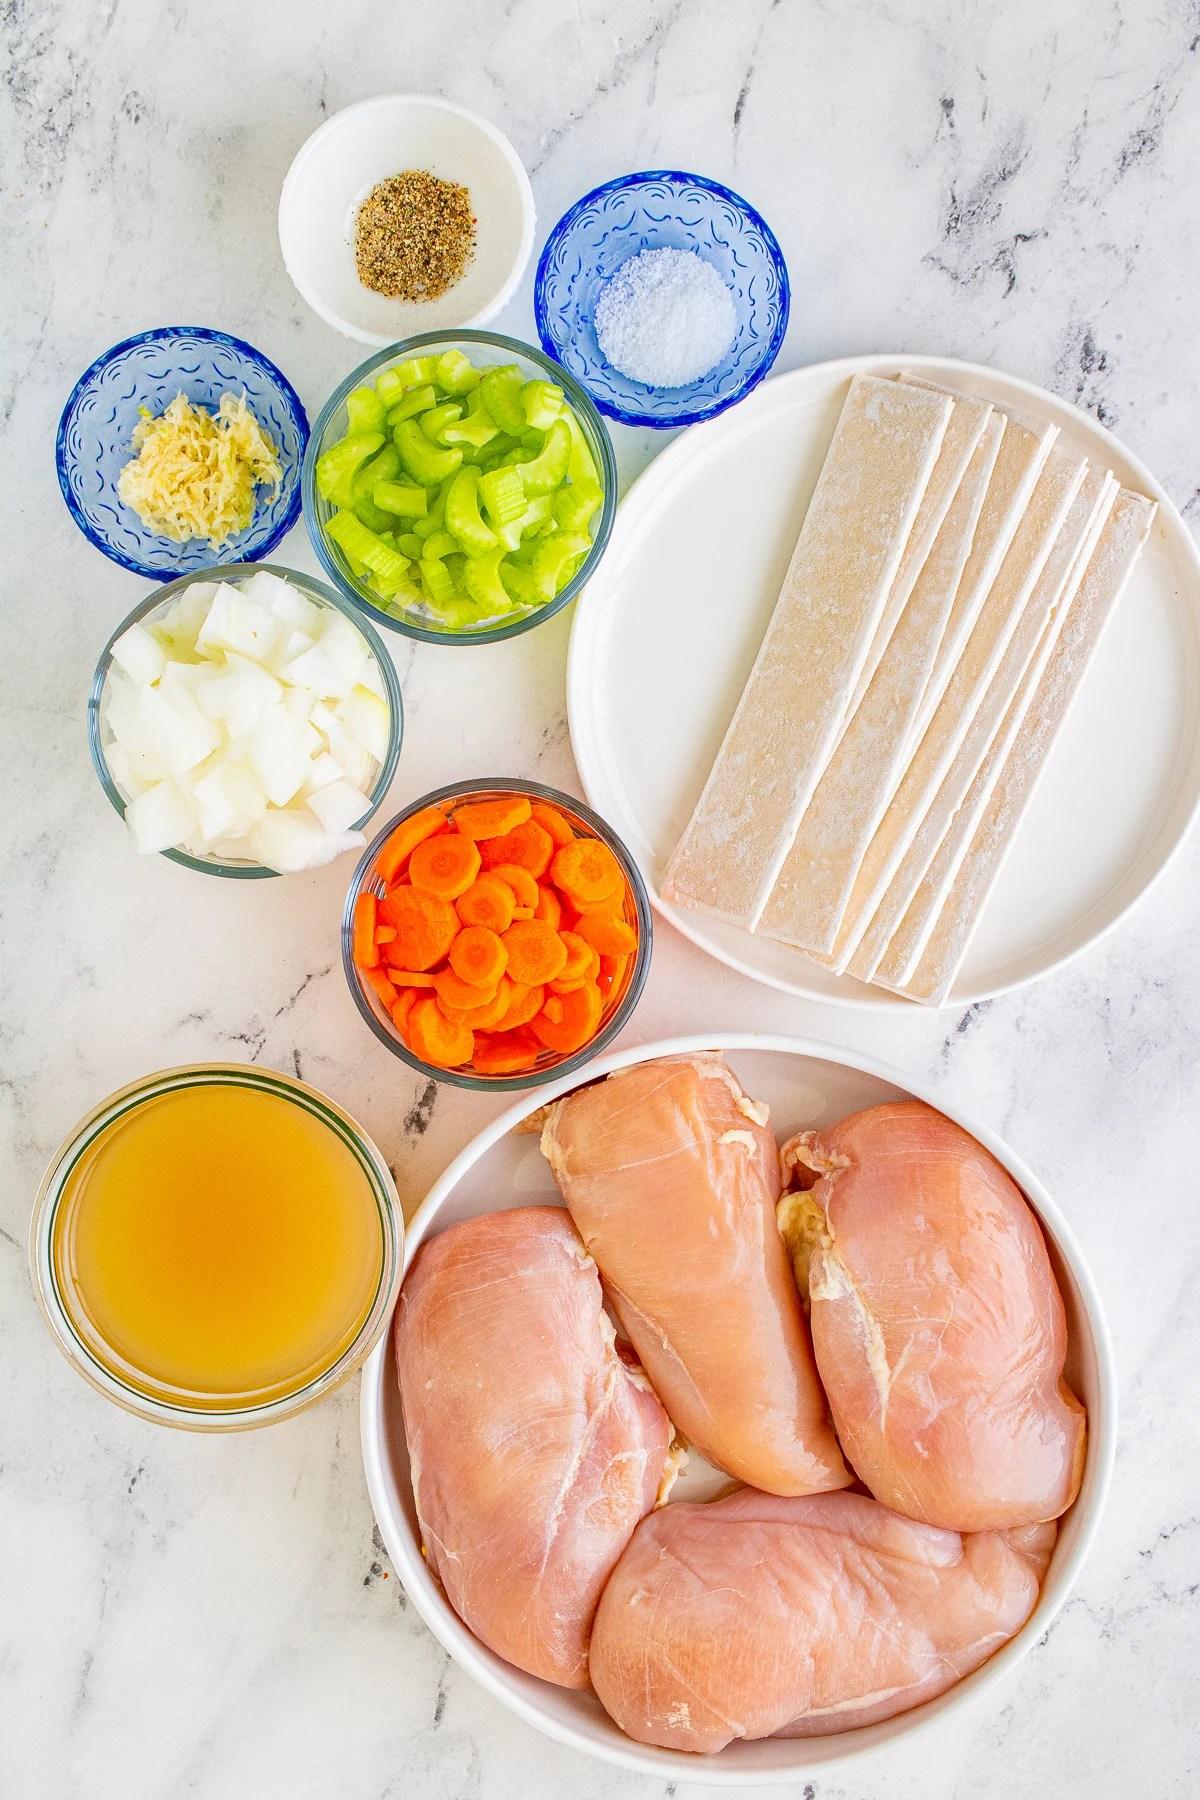 Ingredients needed to make Slow Cooker Chicken and Dumplings